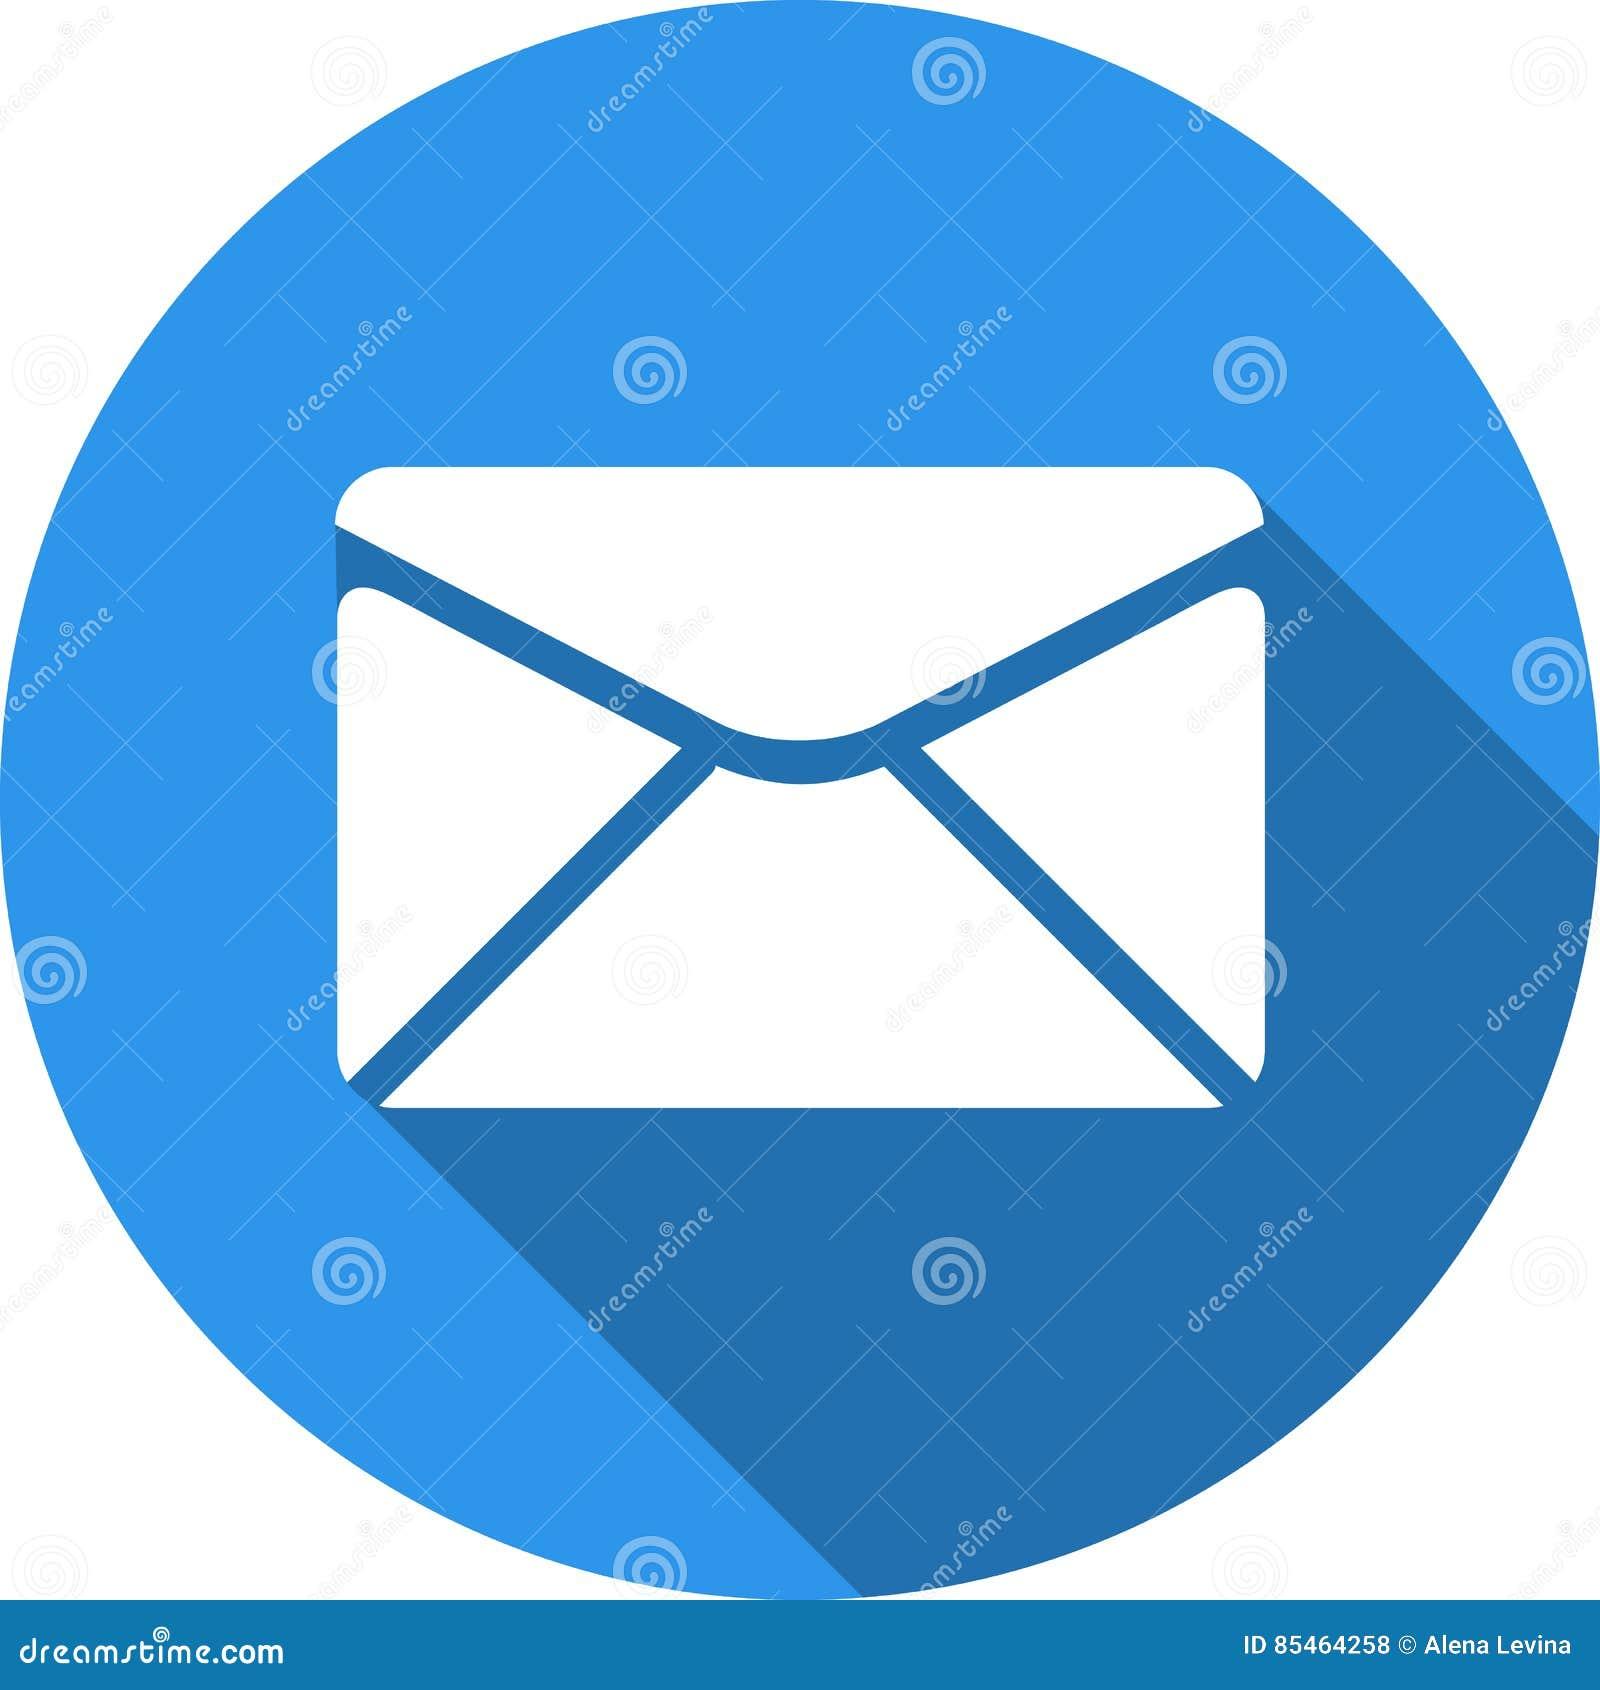 Envelope icon send email message sign internet mailing symbol envelope icon send email message sign internet mailing symbol biocorpaavc Images